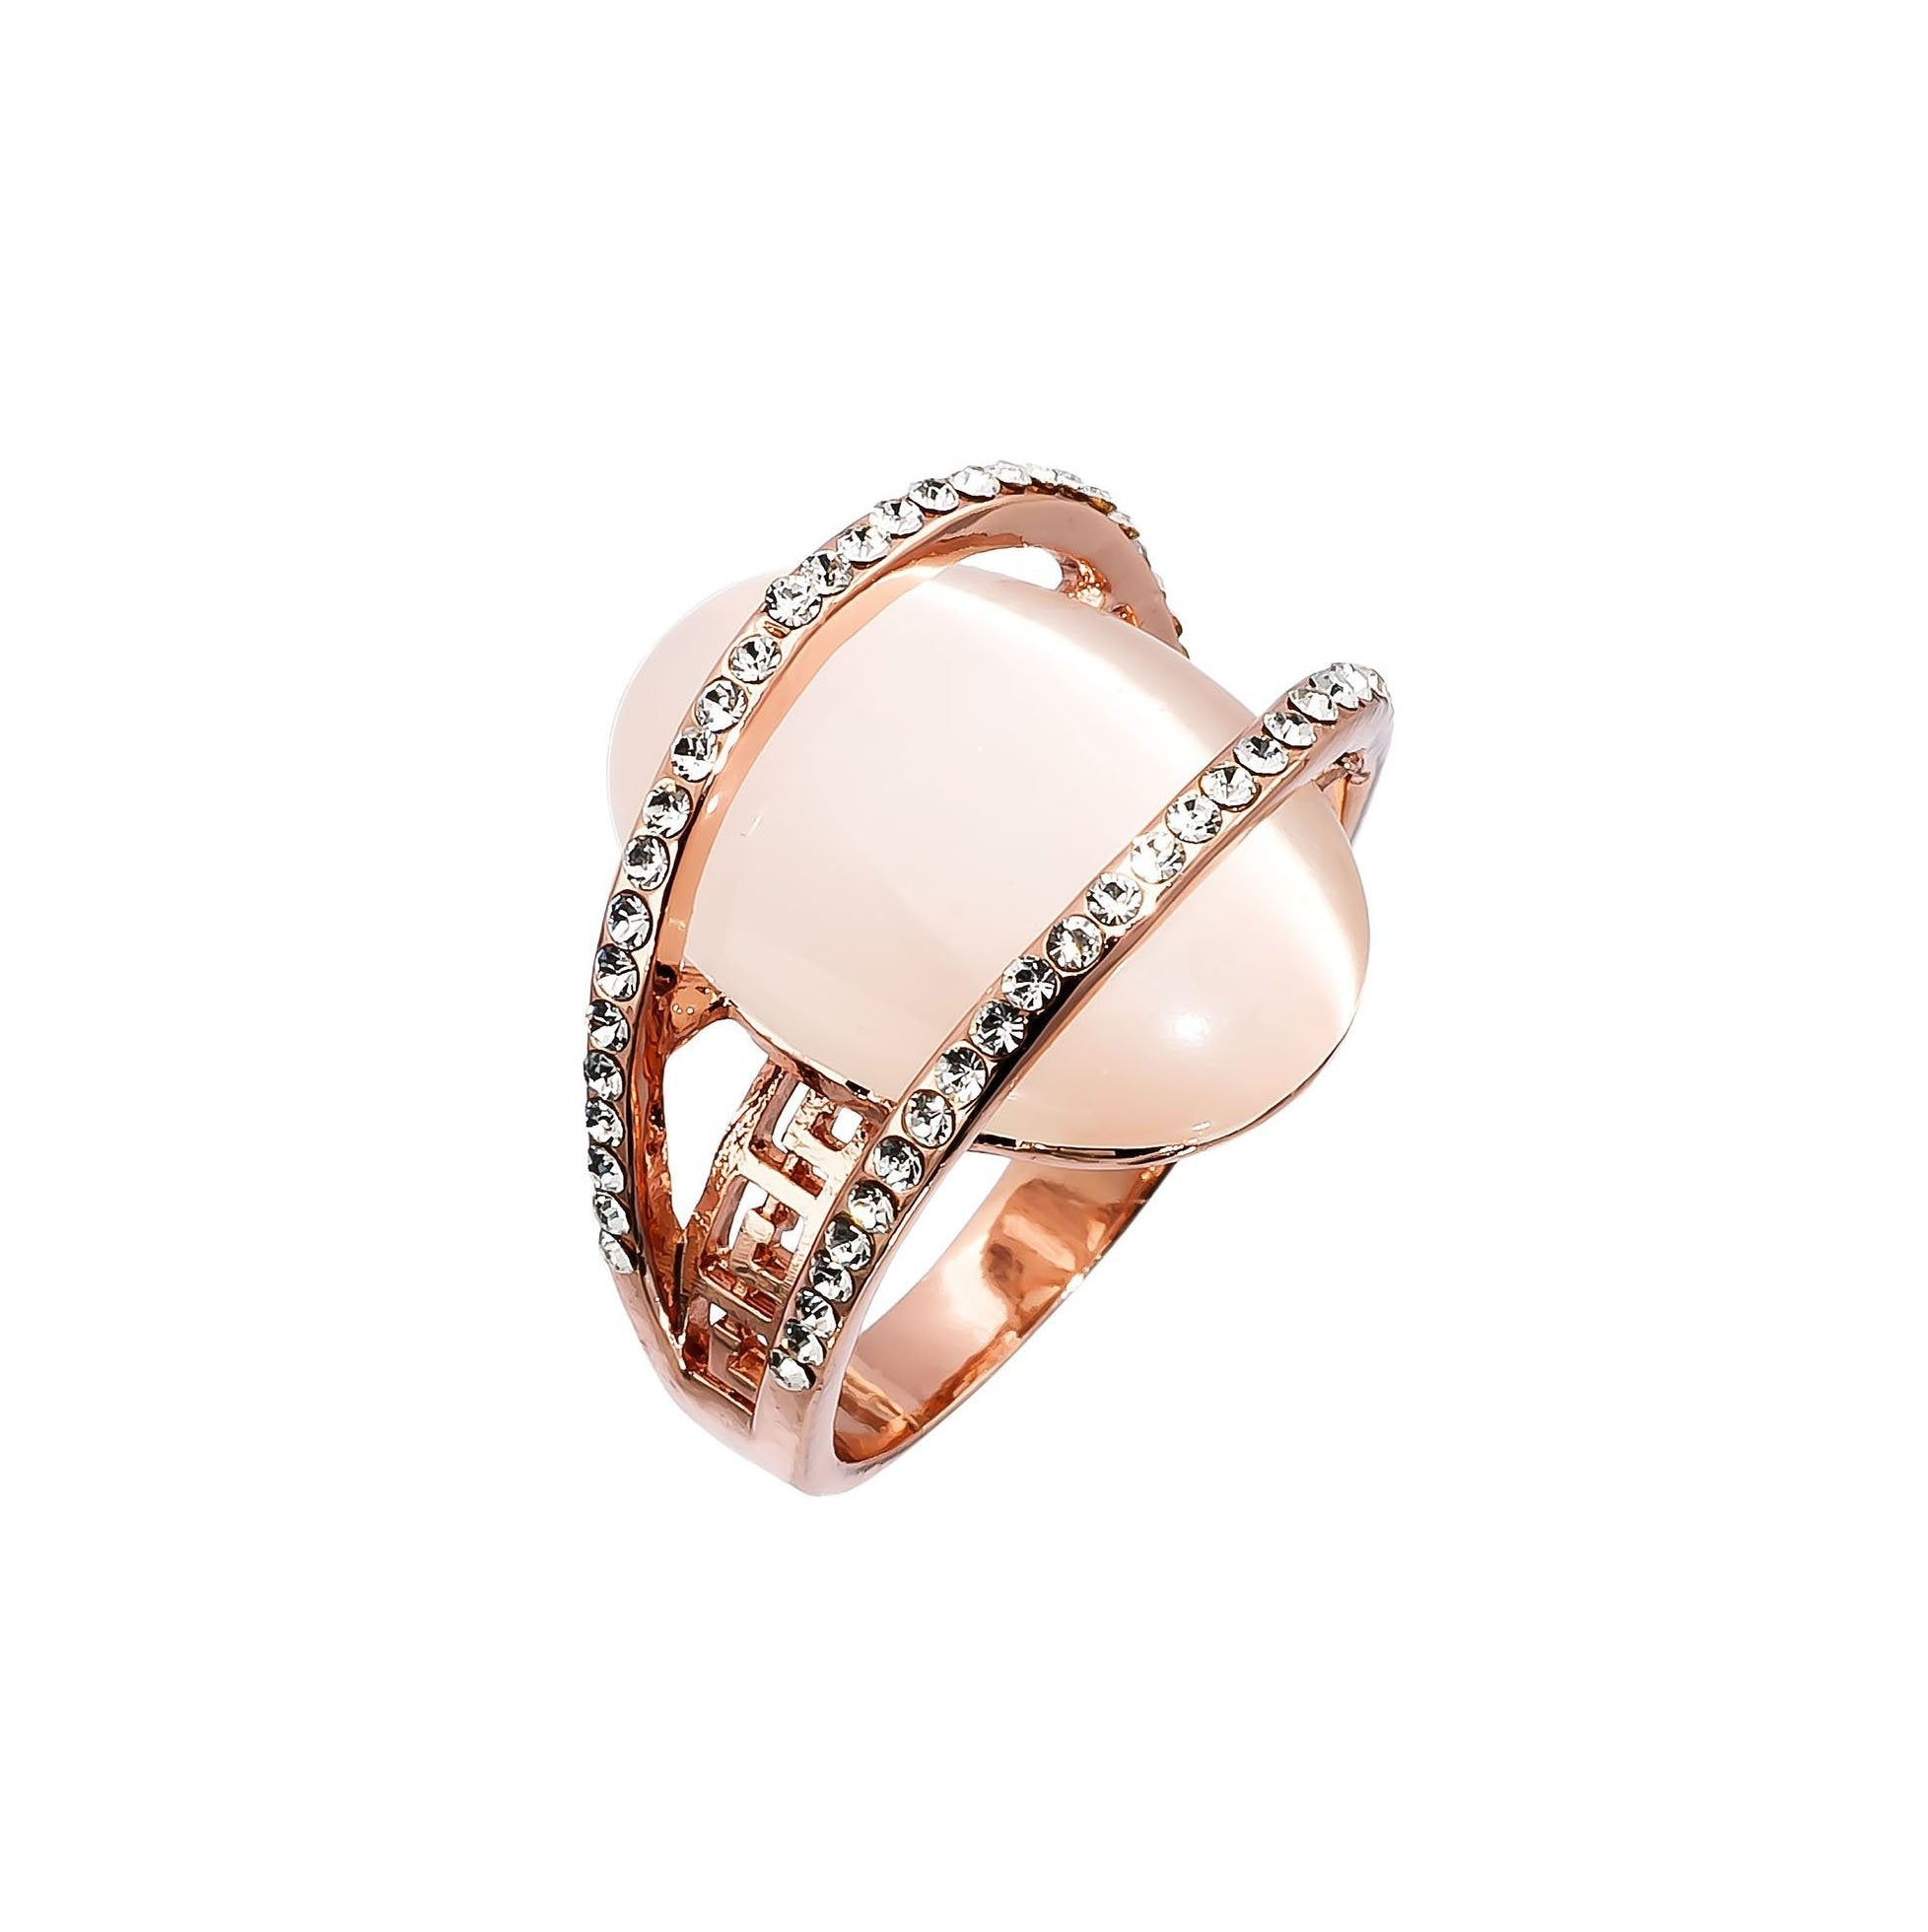 Rome Ring